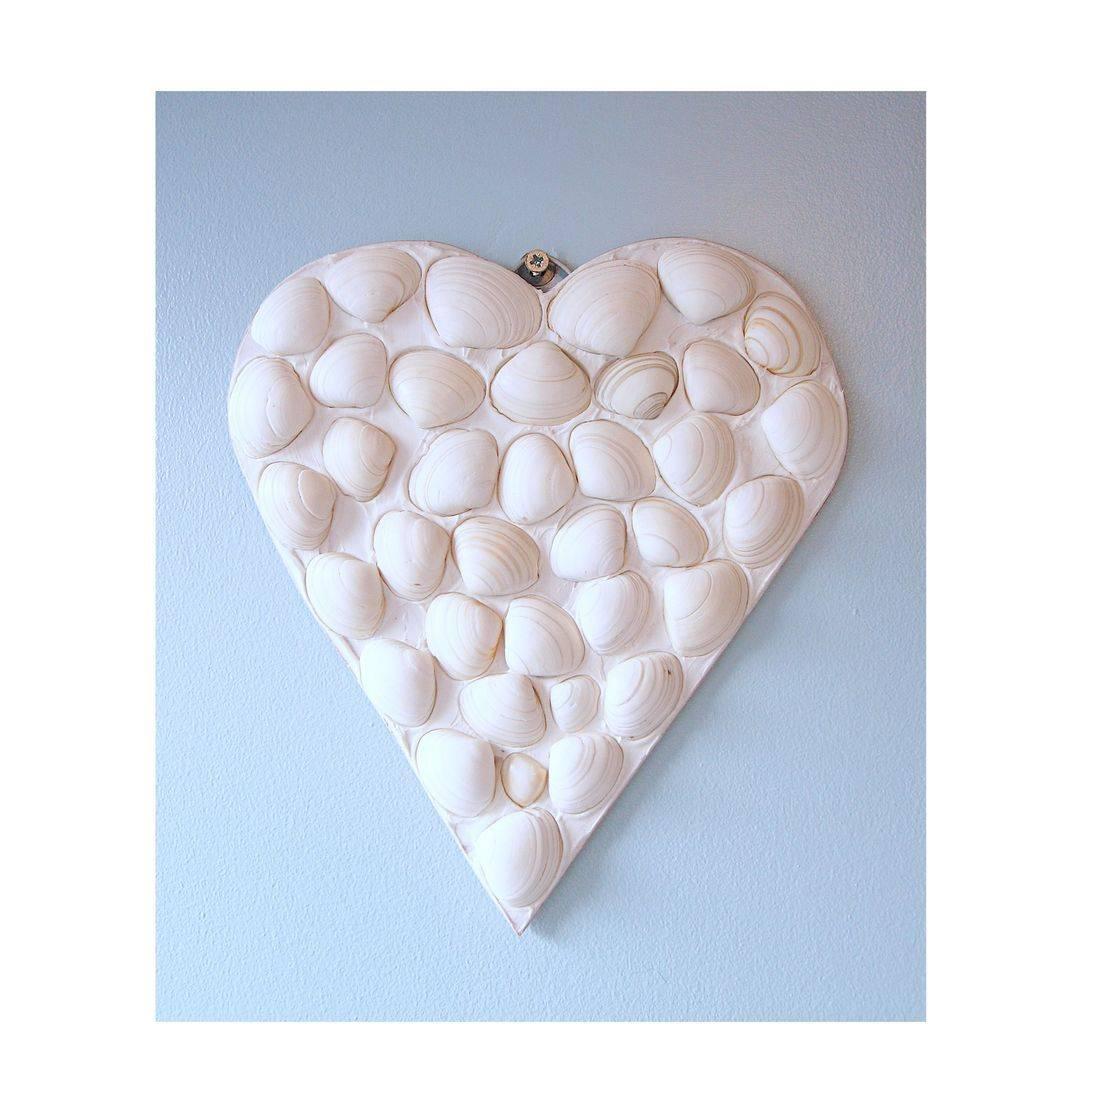 7 Mosaic Shell white heart